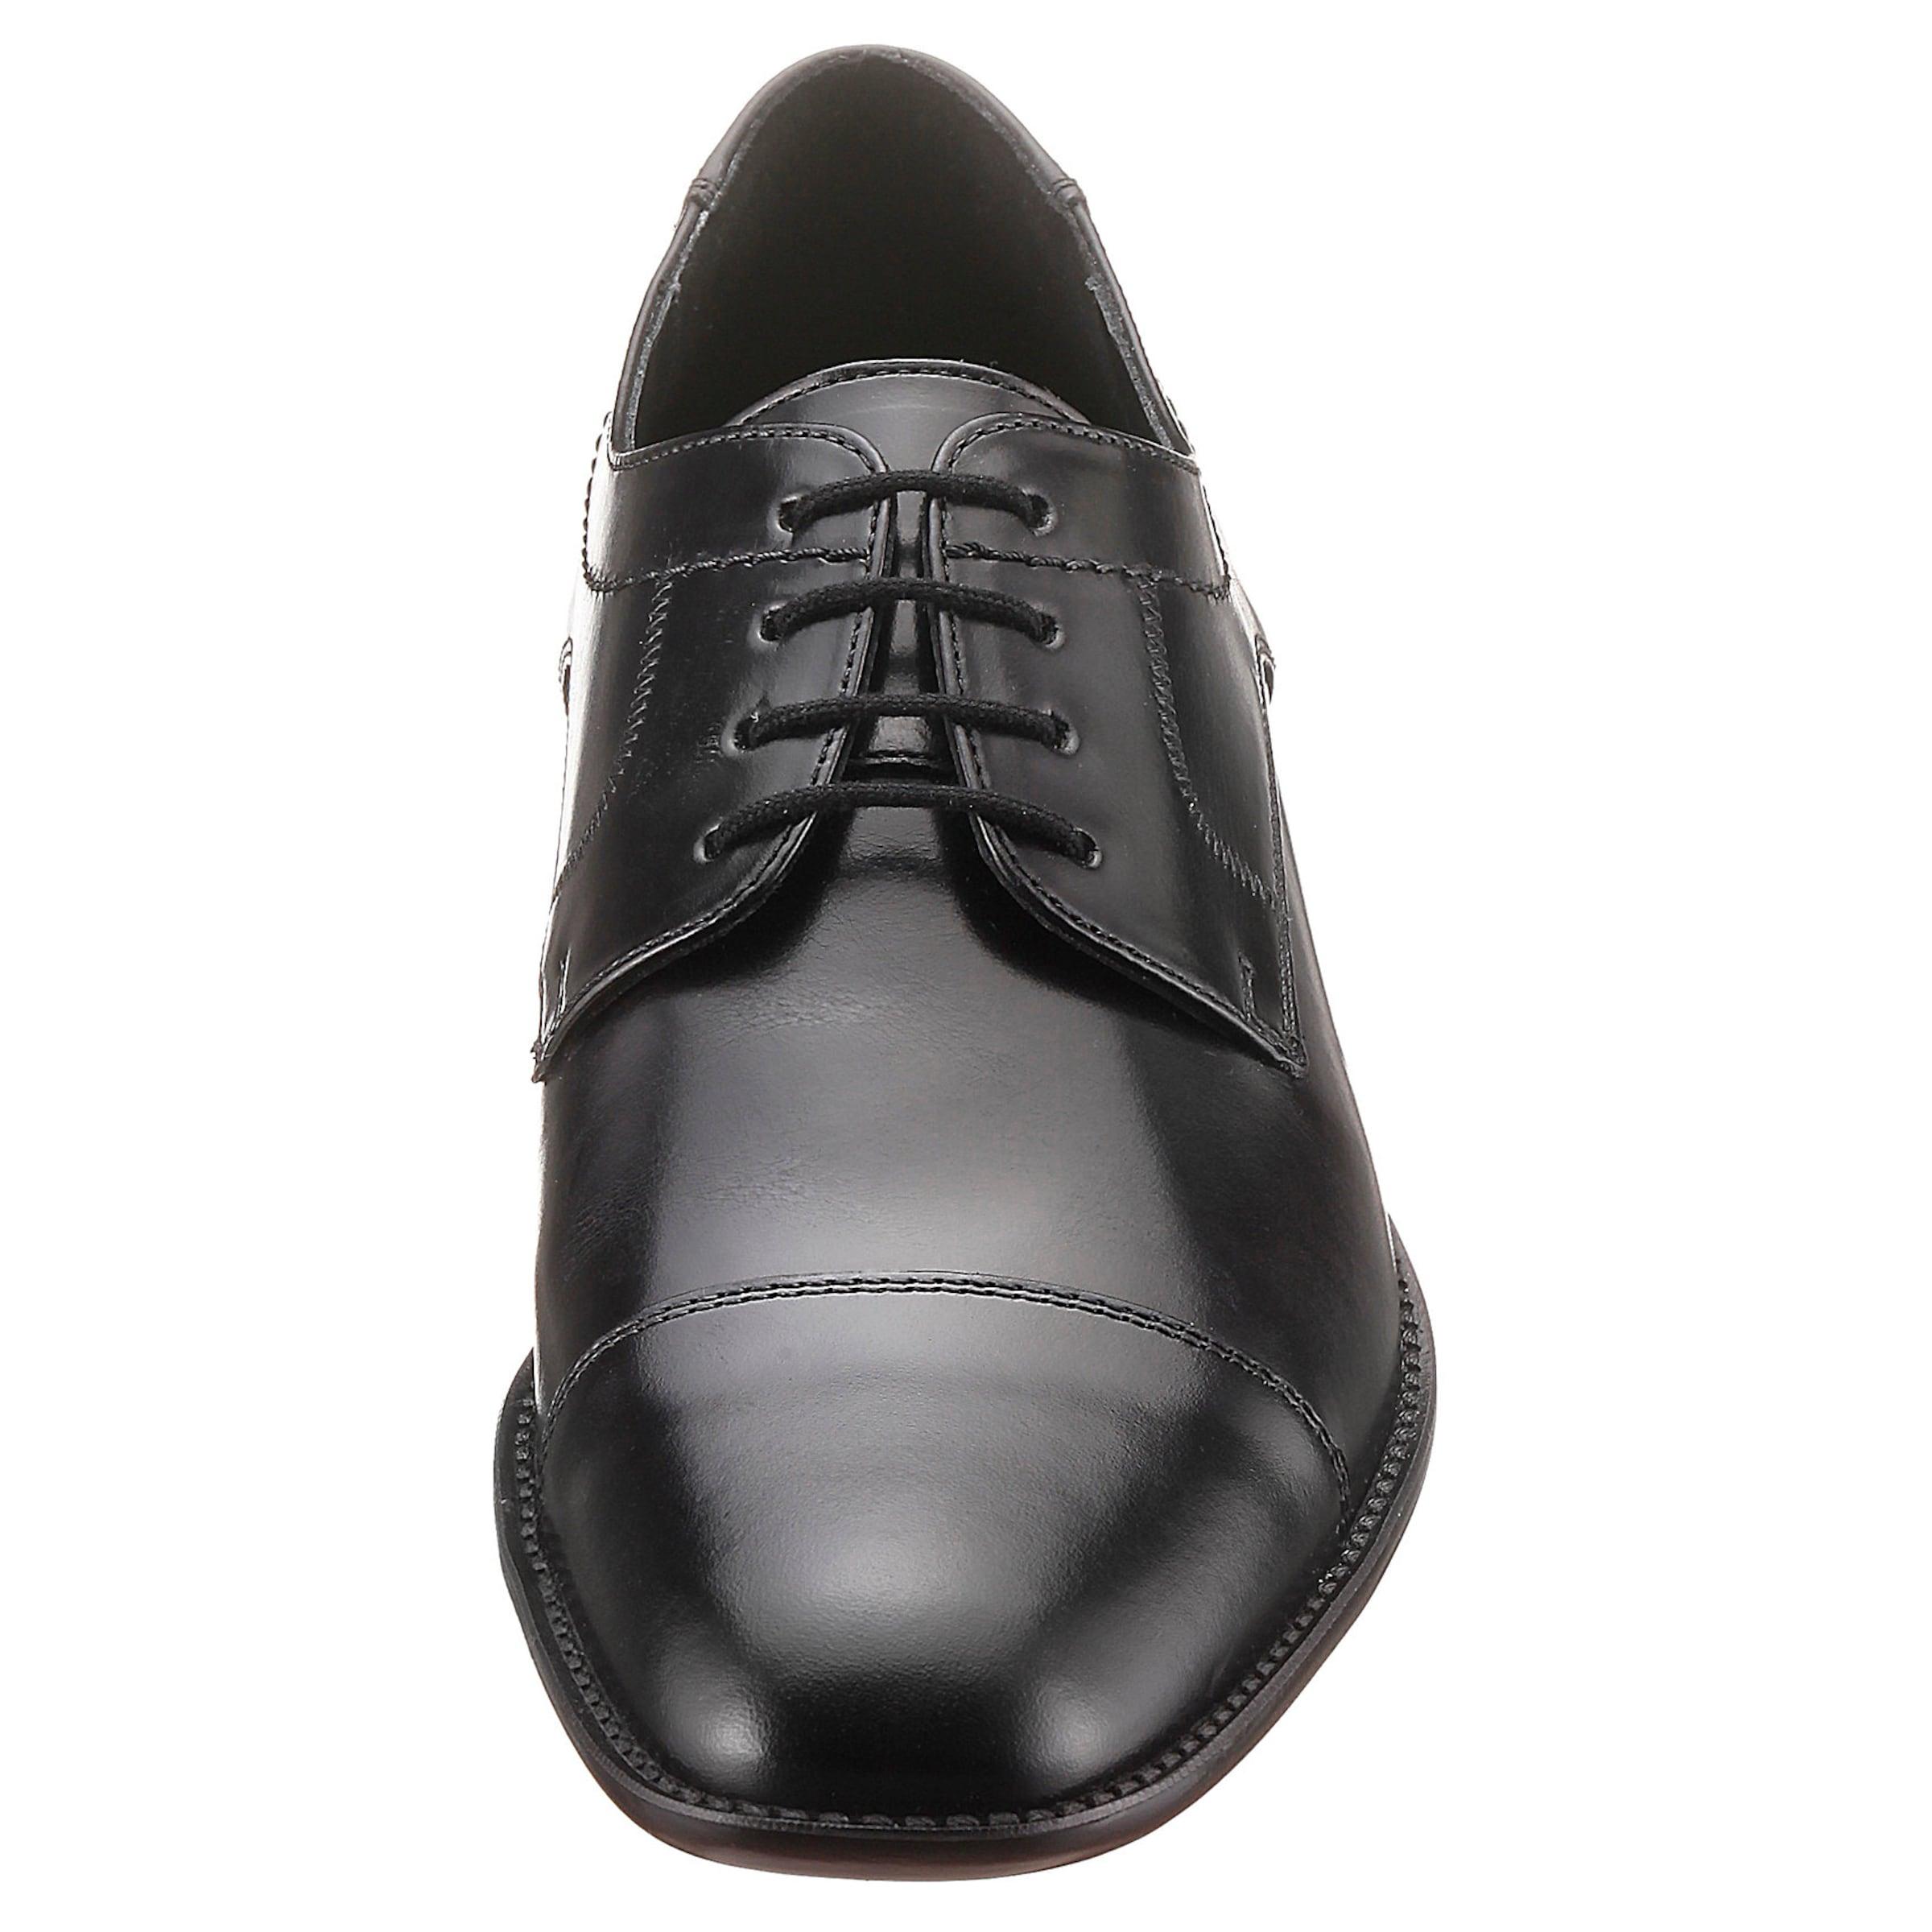 Schwarz In Lloyd Galant Schuhe Business J3uTlFKc1